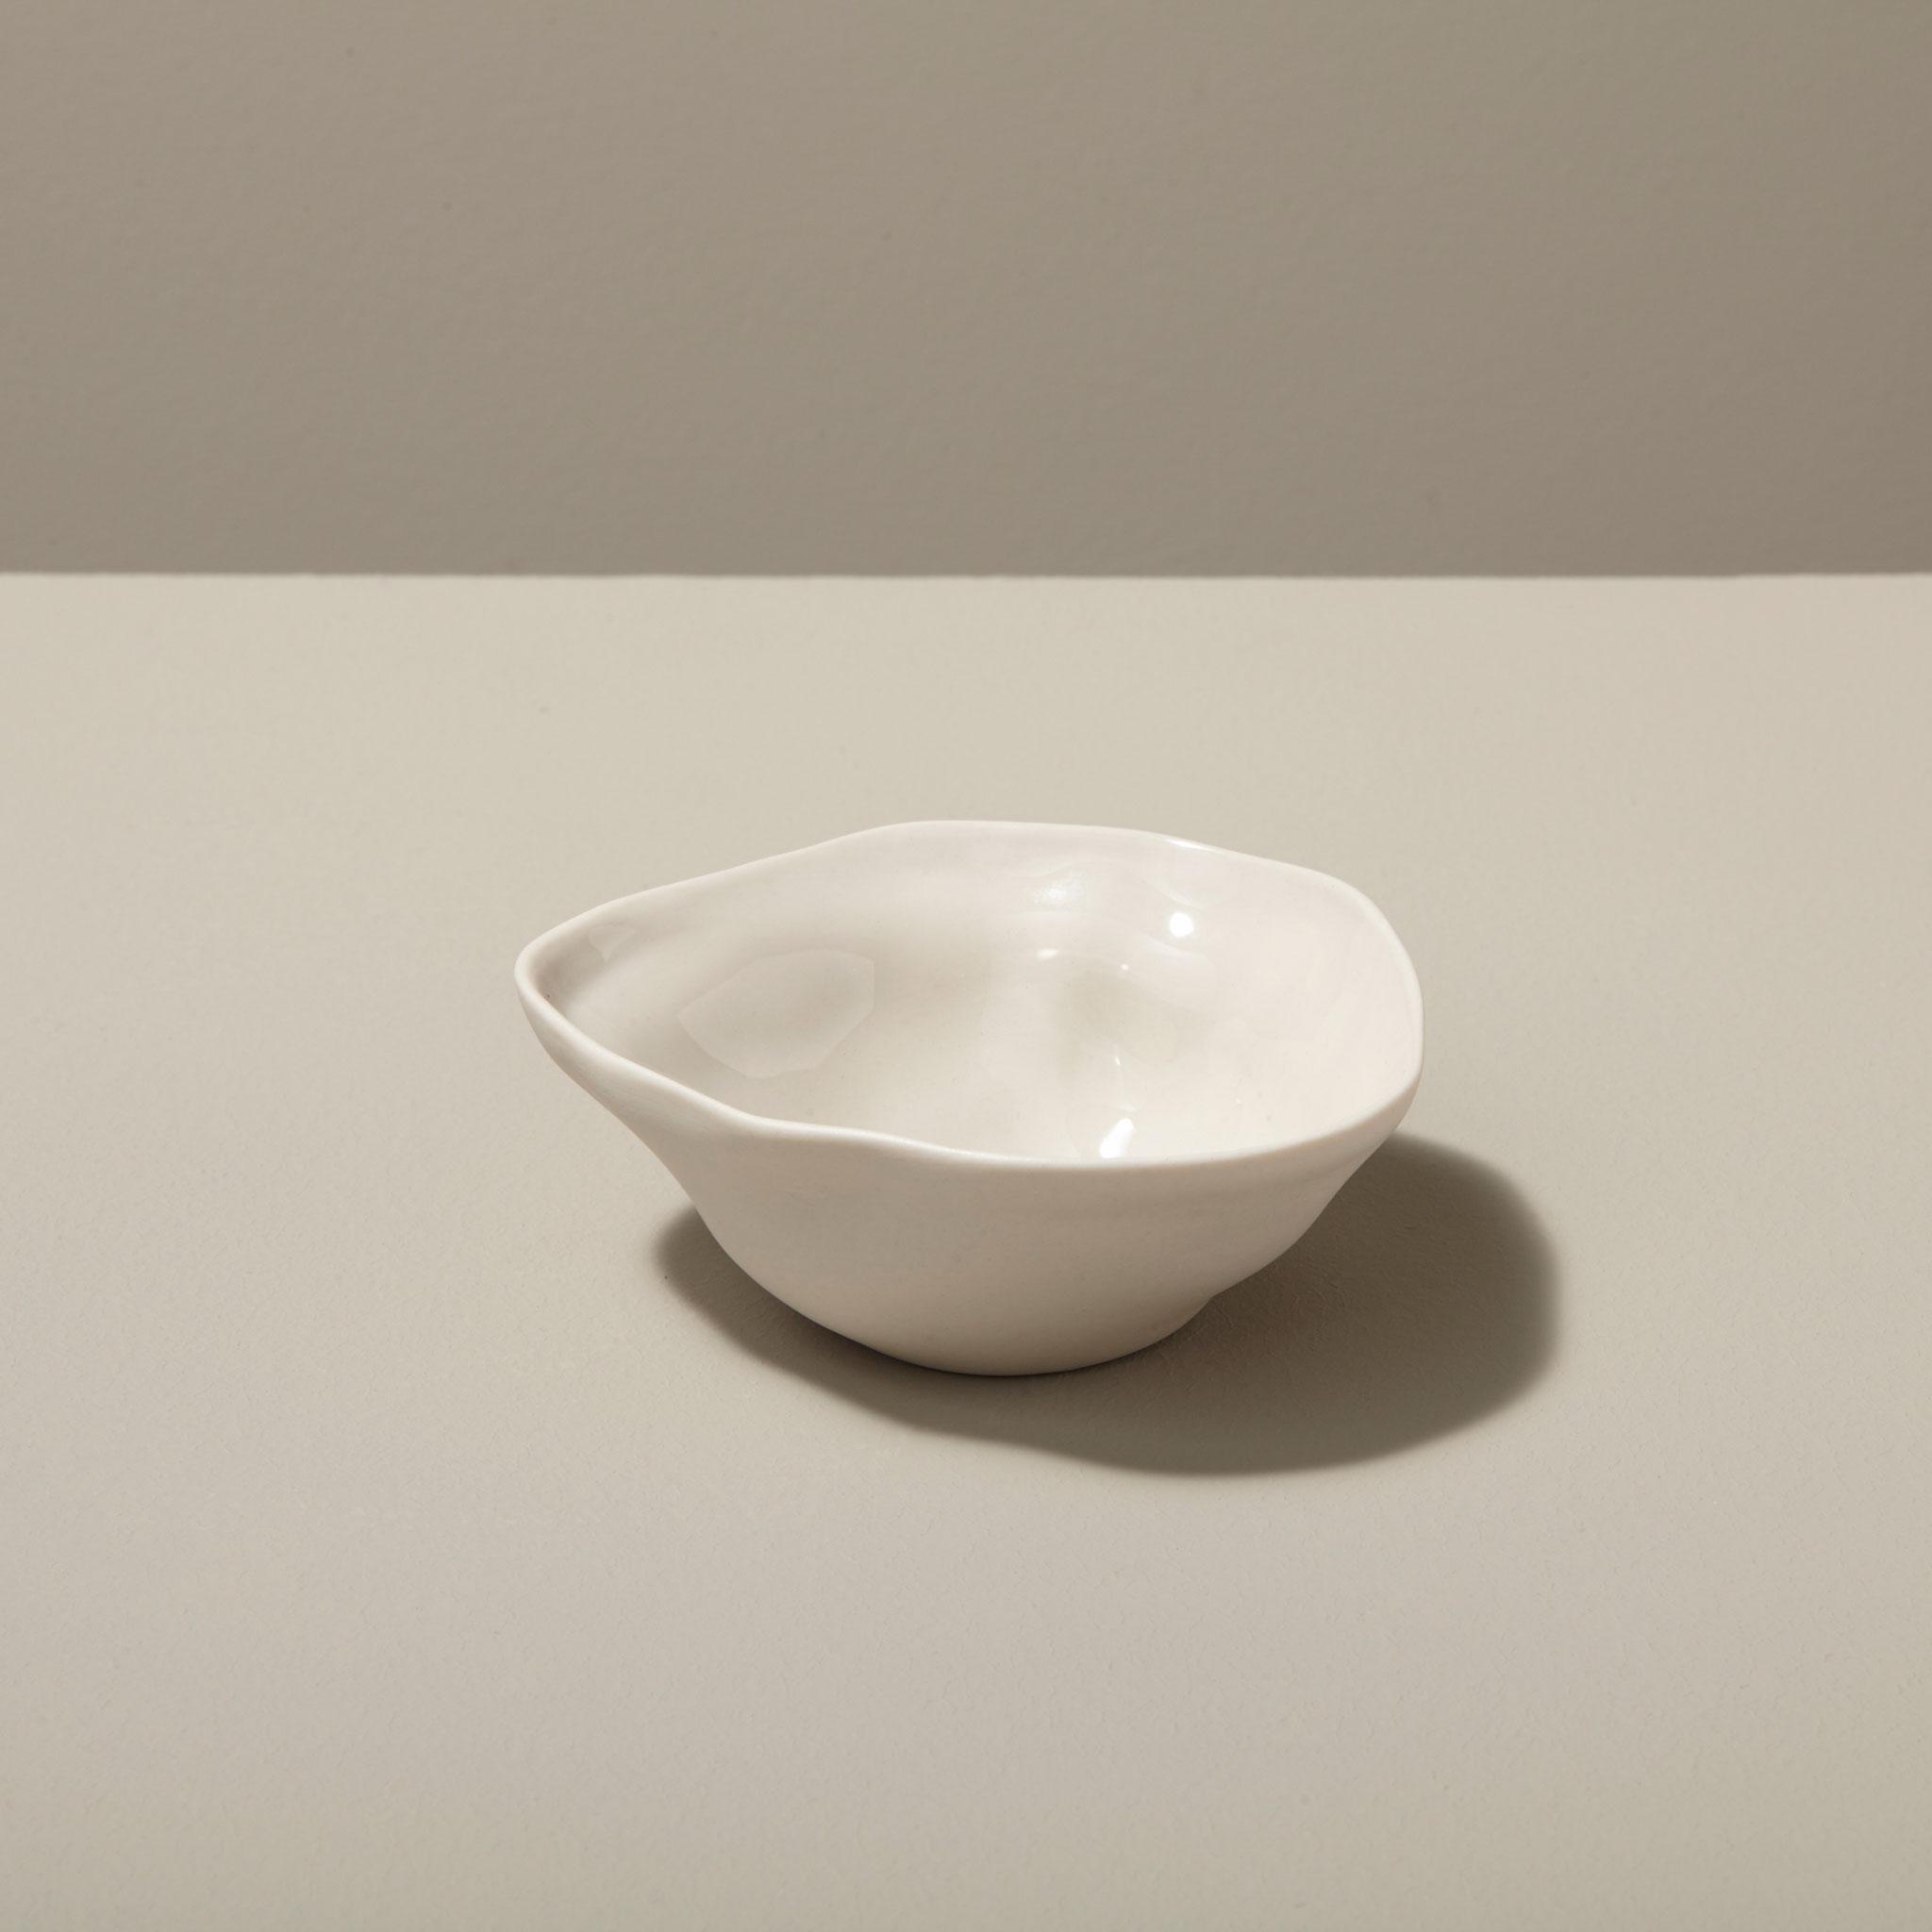 Be-Home_Stoneware-Pinch-Bowl-White_64-694